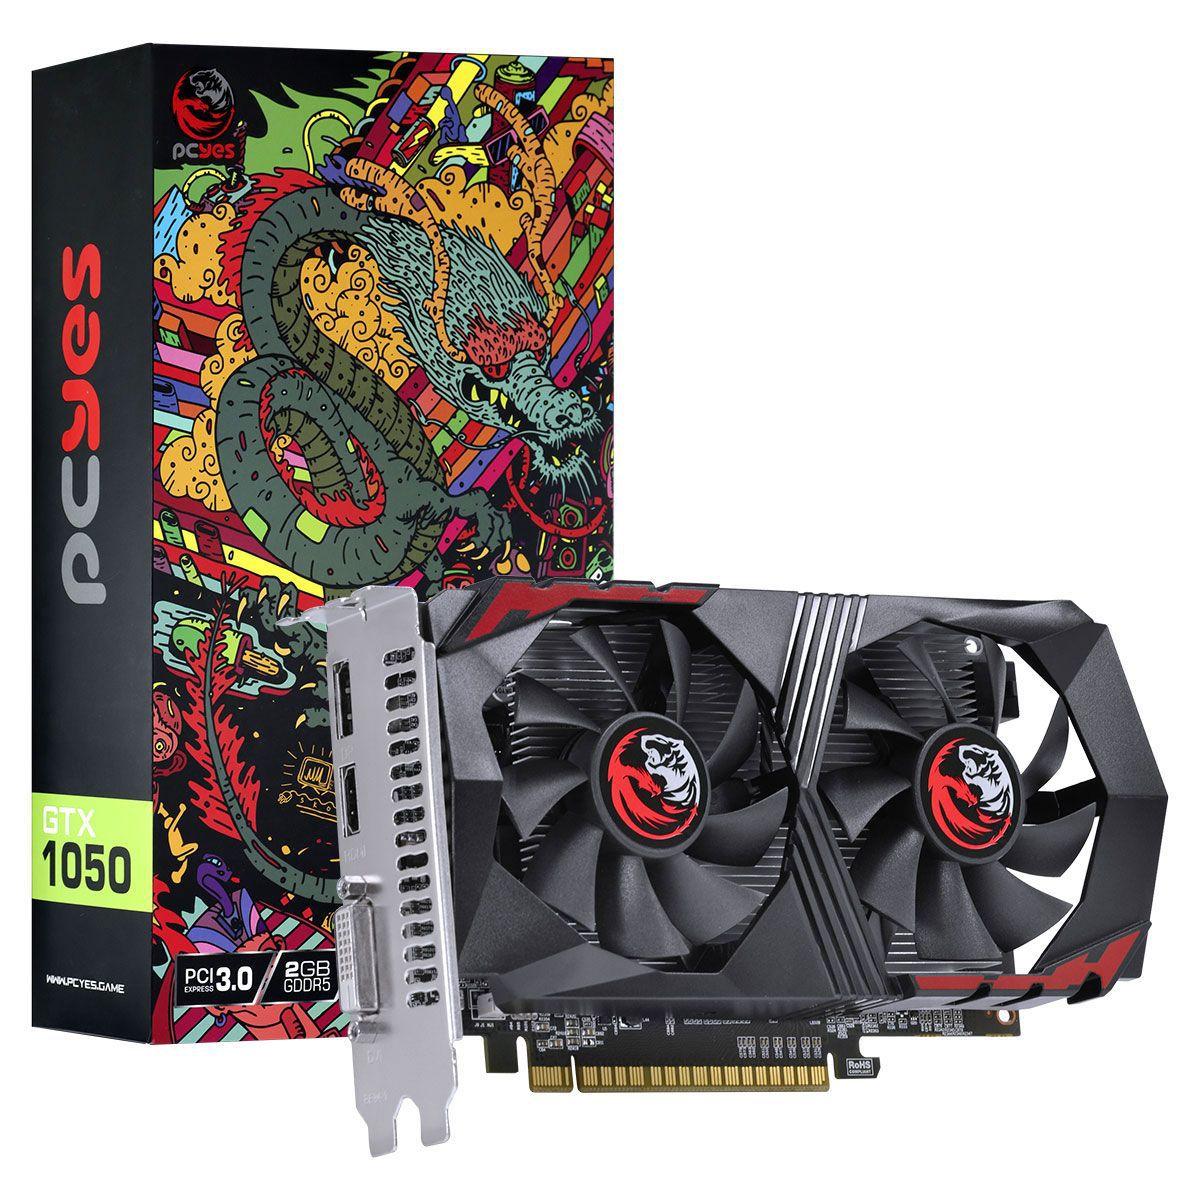 Placa de Vídeo GTX 1050 2GB Nvidia Geforce - Pcyes